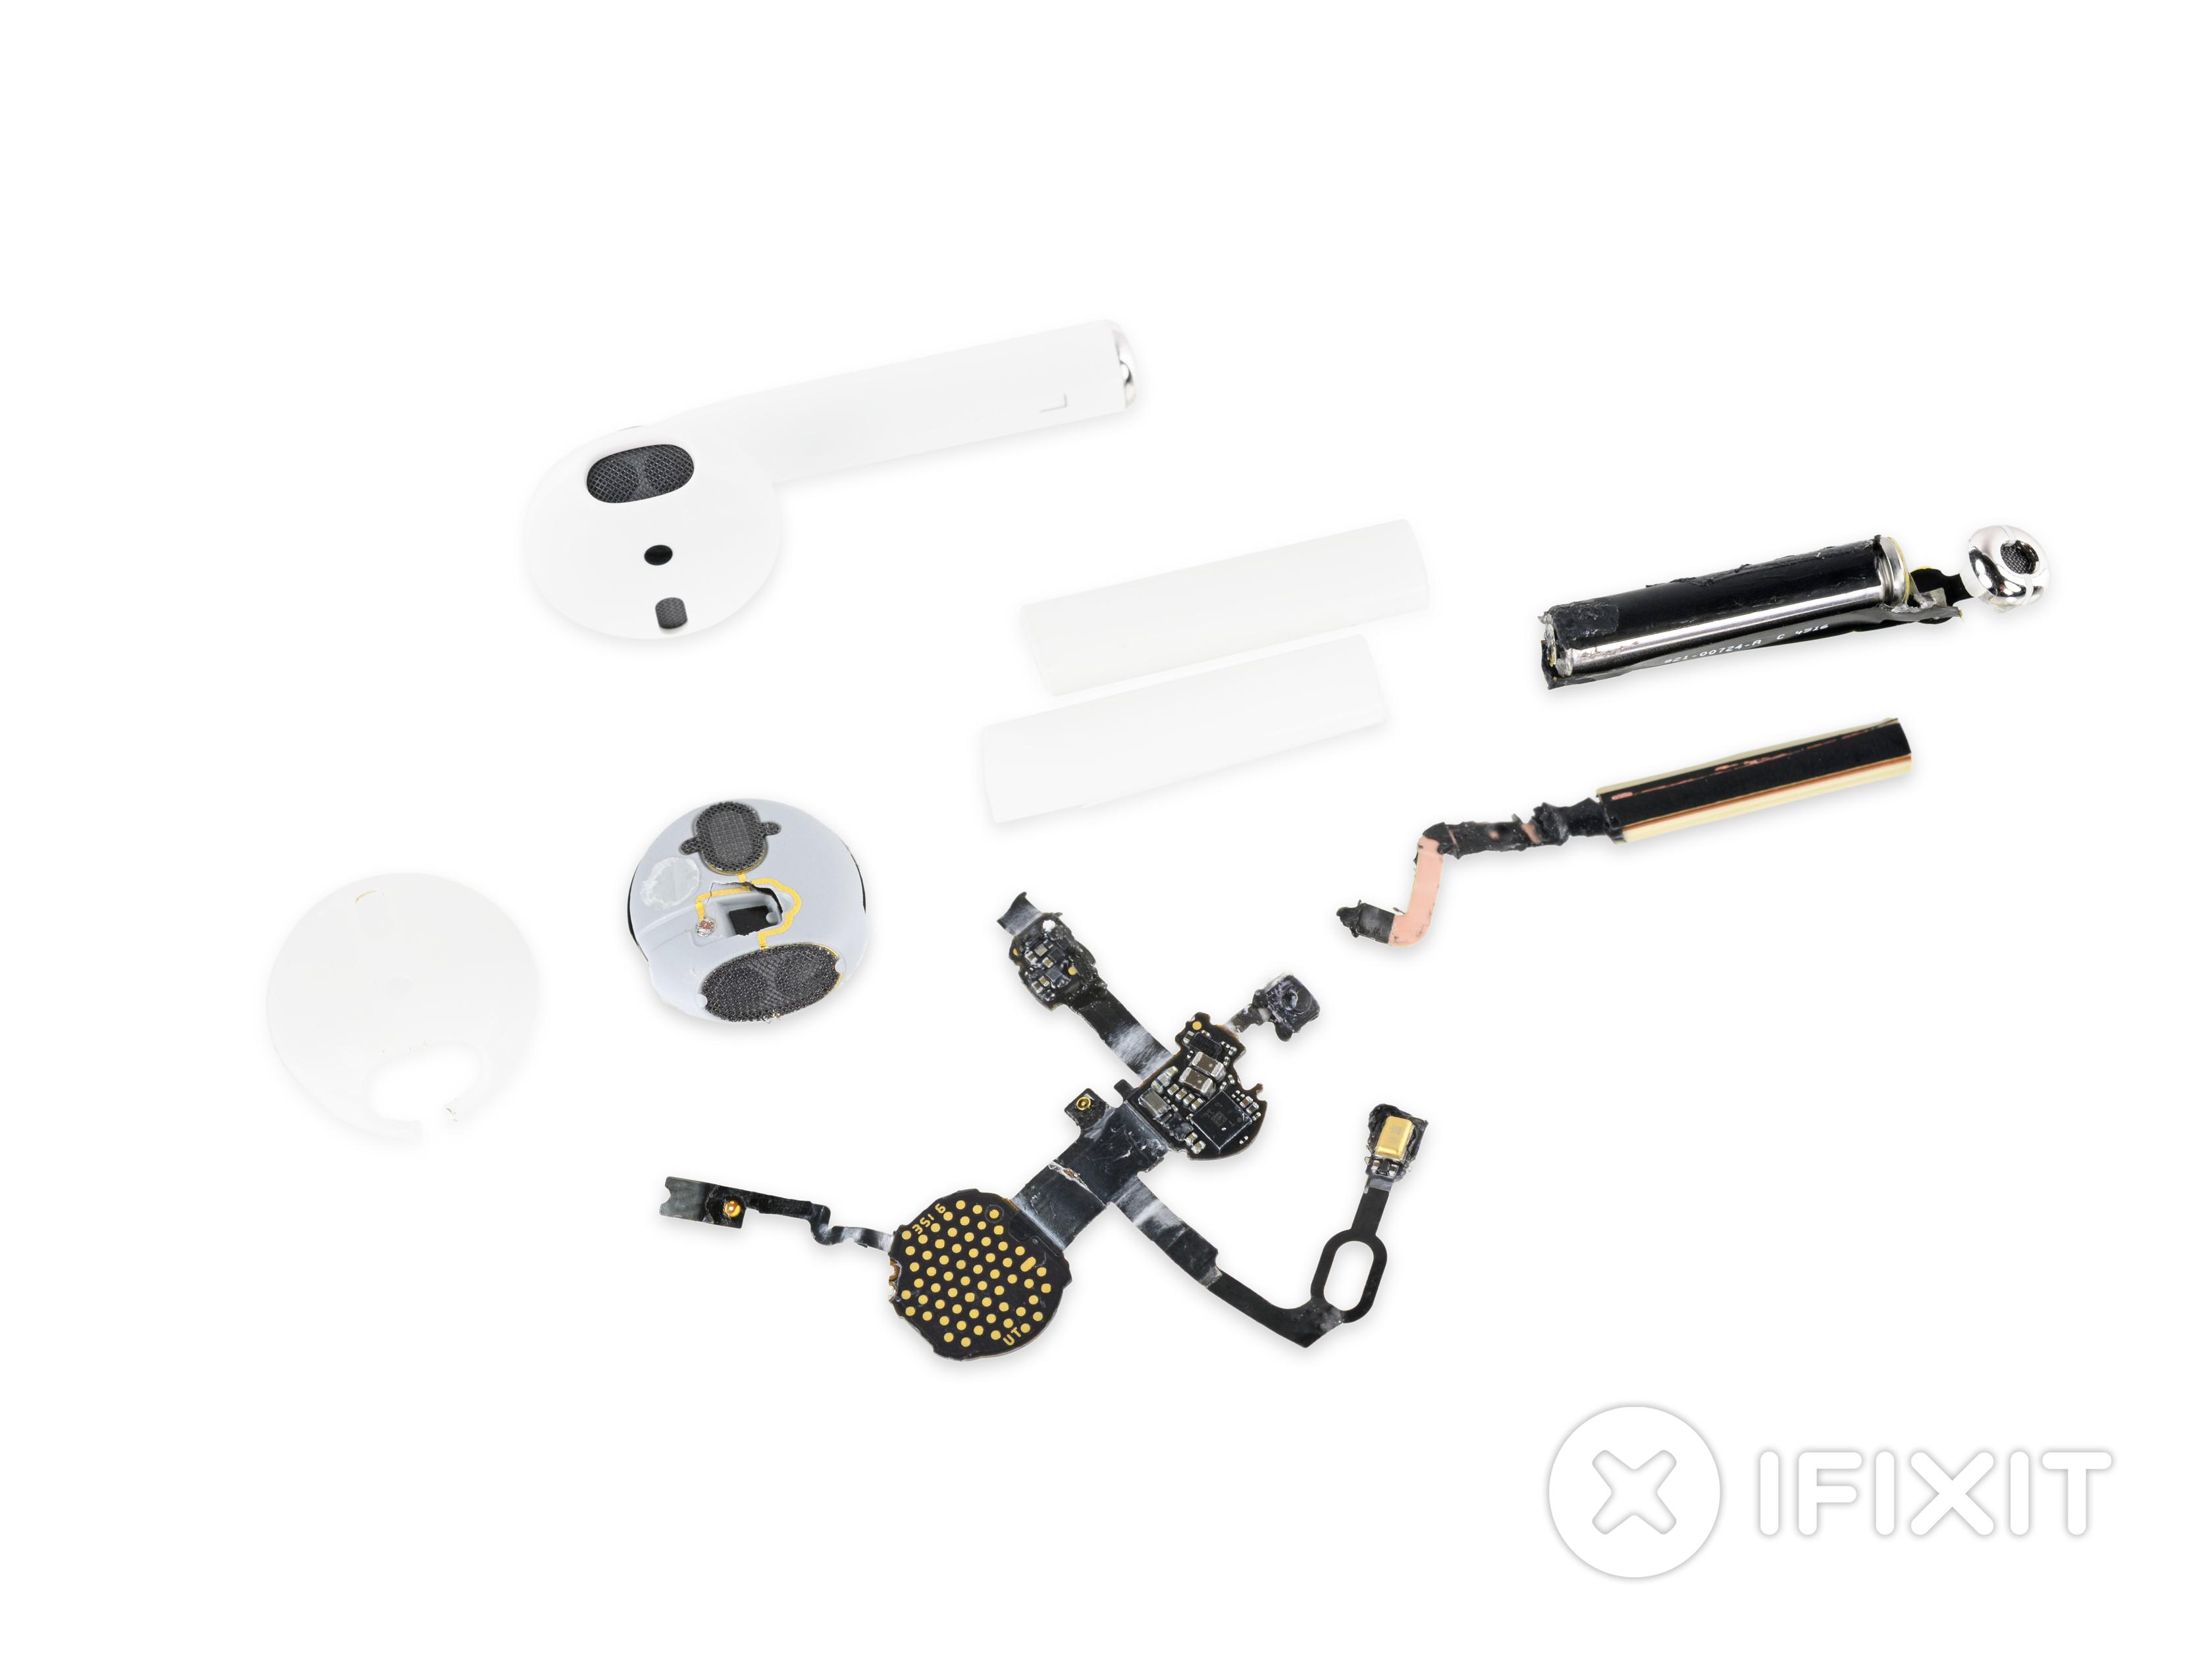 In Ear Headphone Repair Ifixit Klipsch Wiring Diagram Airpods Teardown